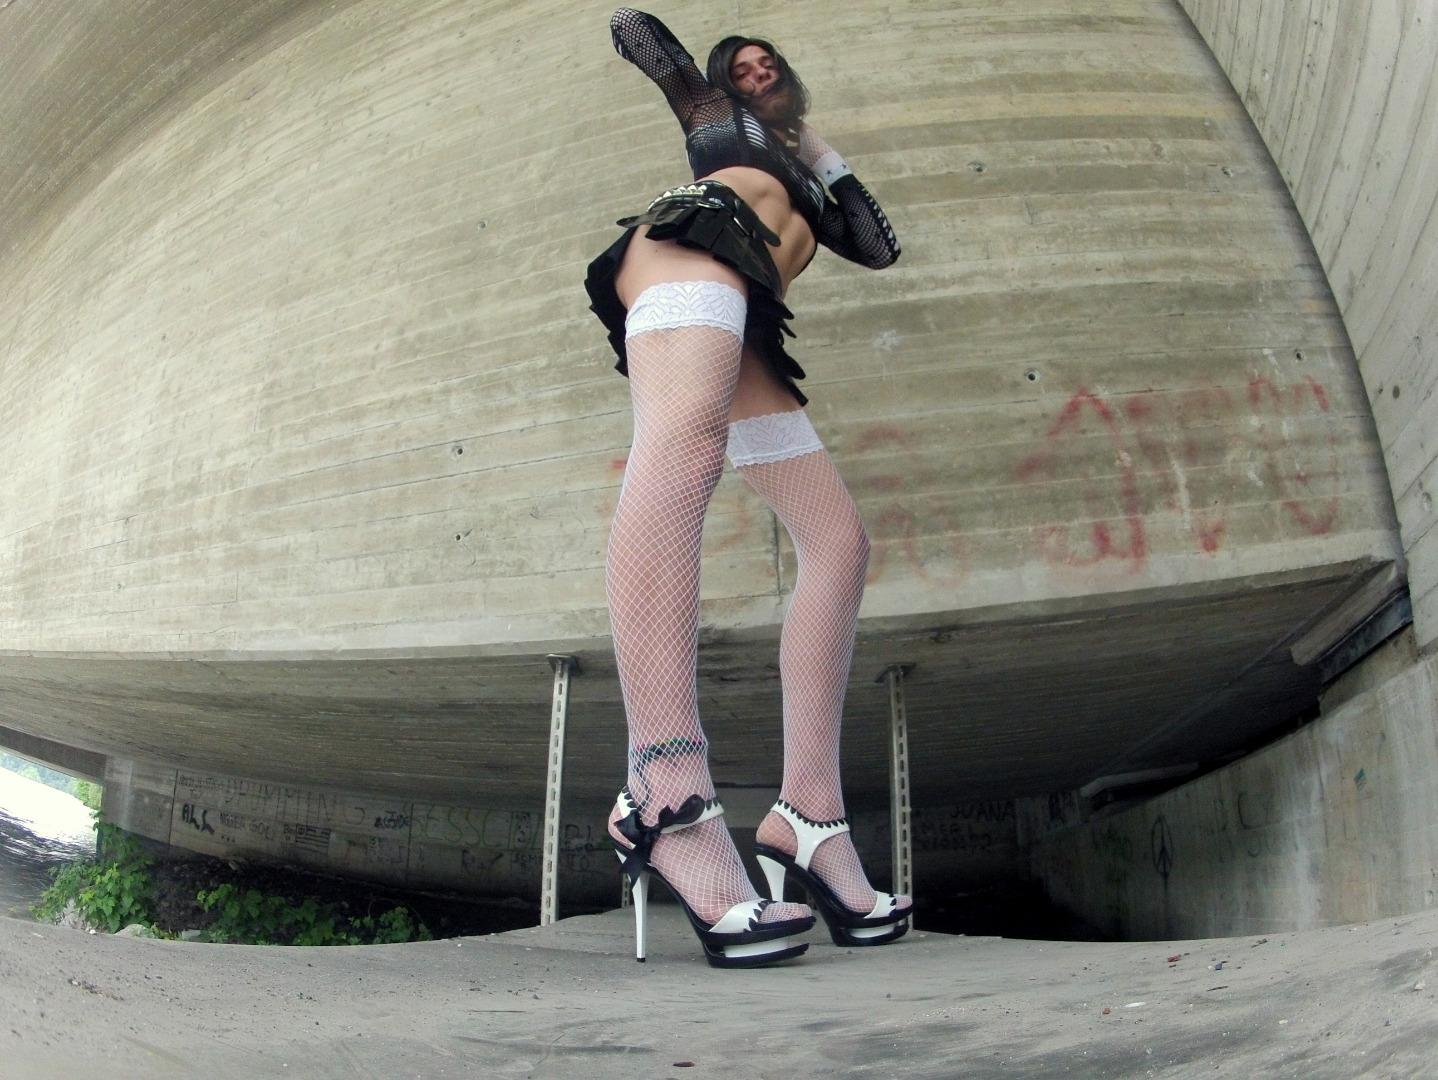 twerking tube videos delicious free porn